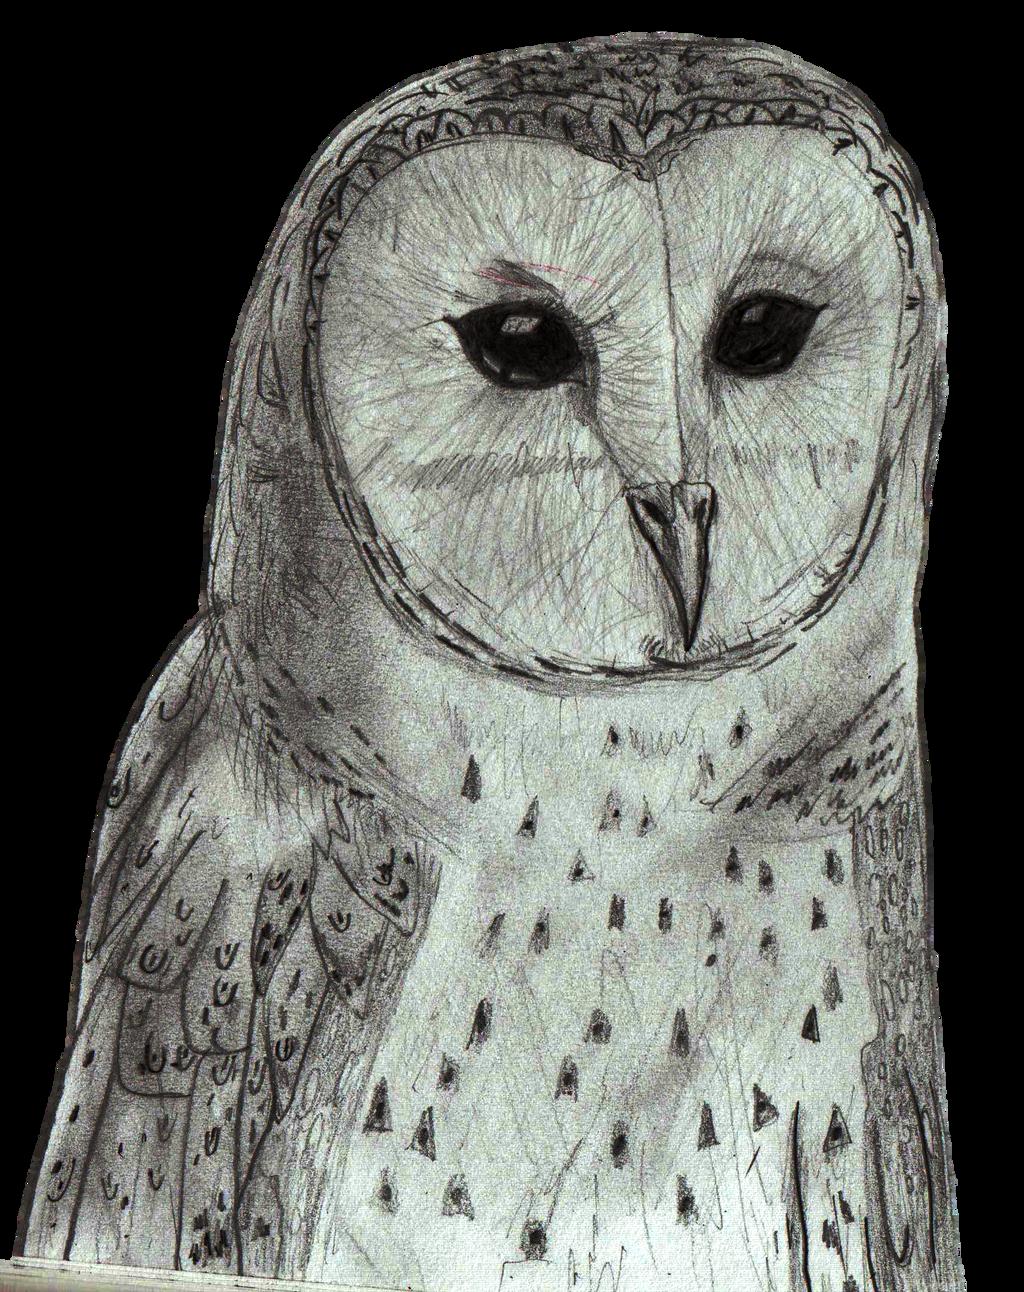 Australian Masked Owl Pencil Sketch By Mrdanieljking On Deviantart